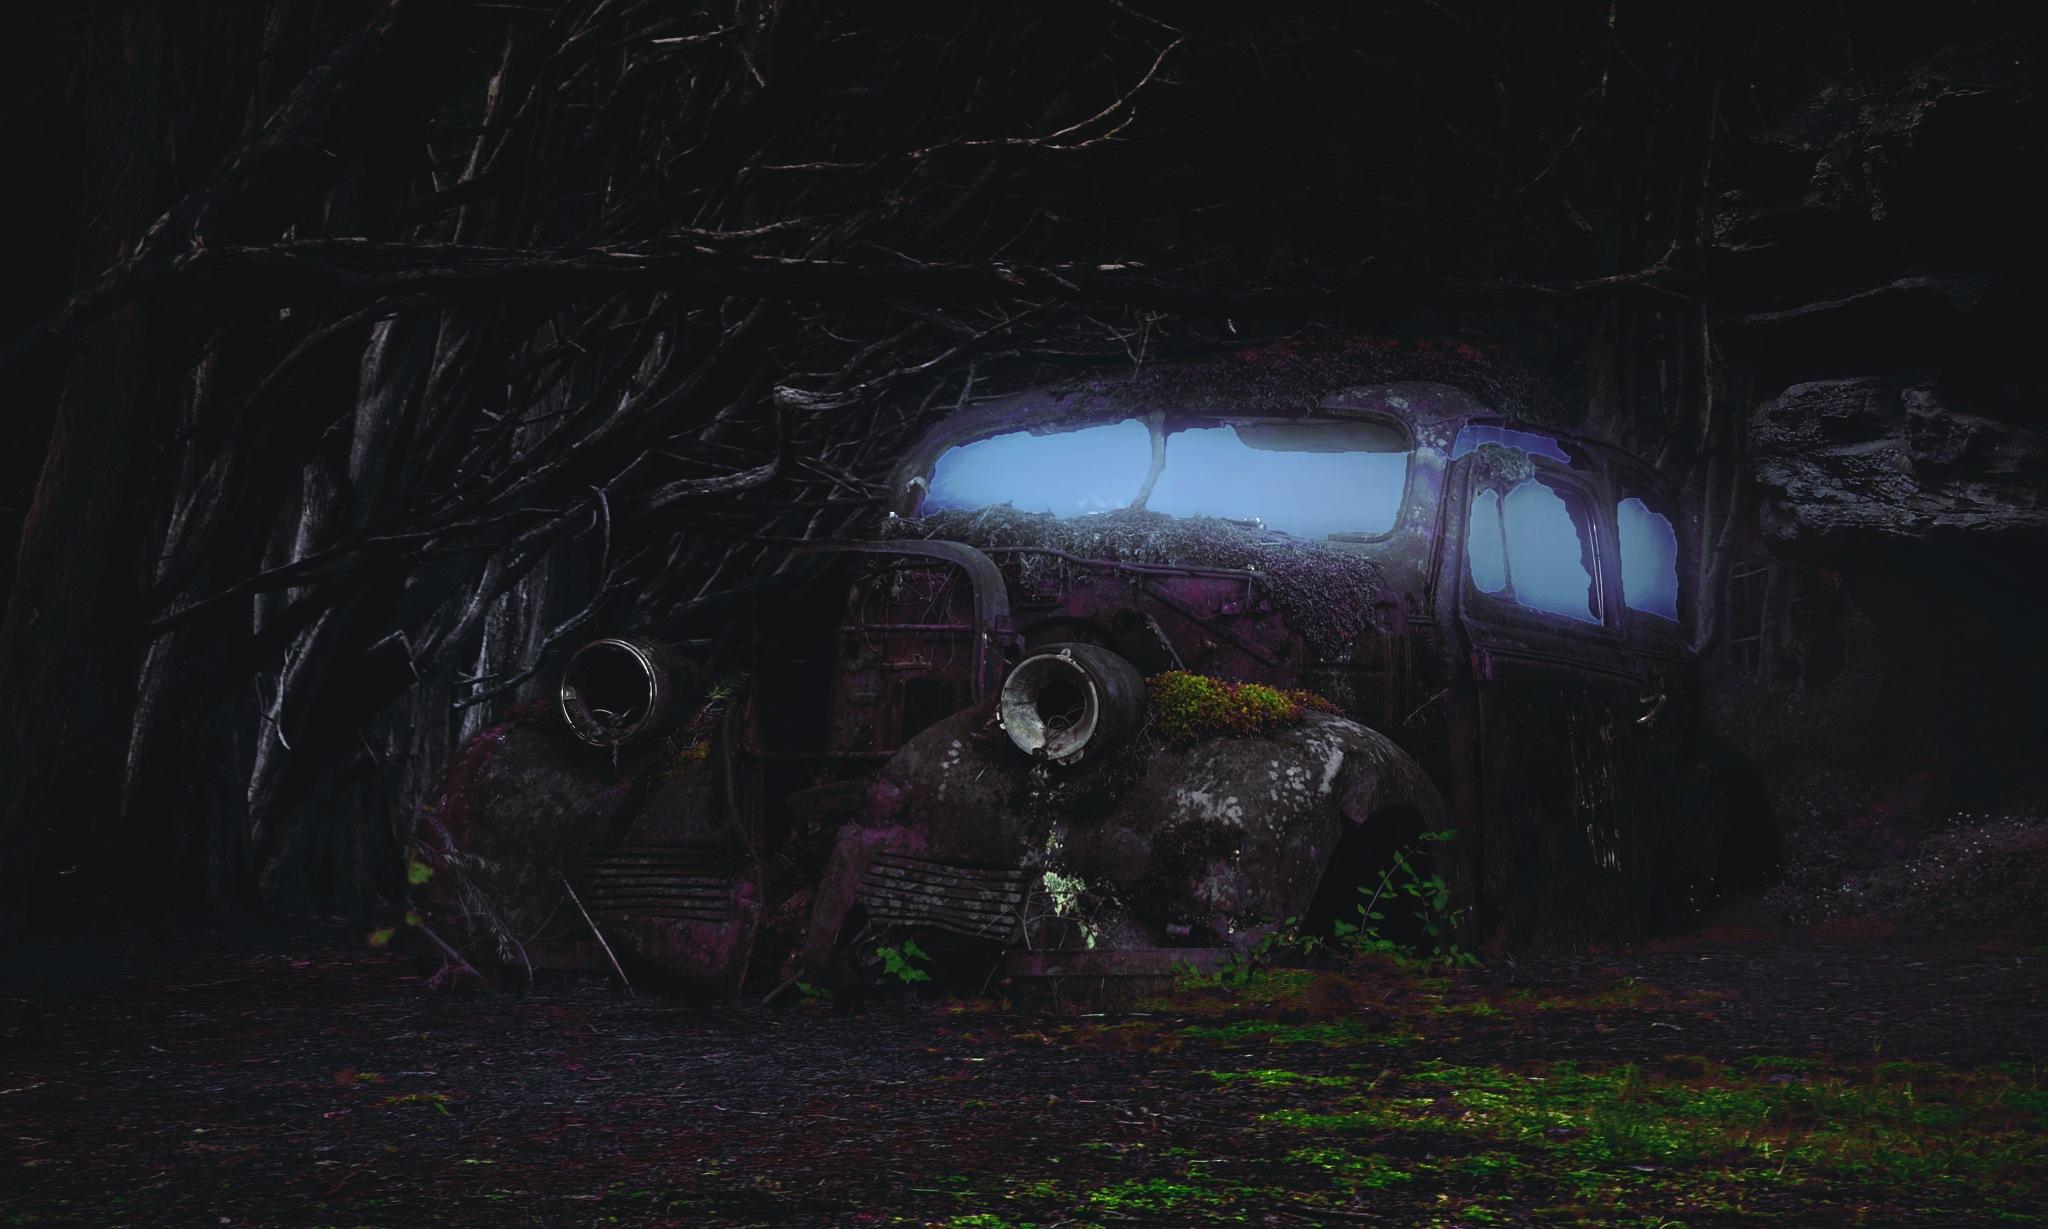 HAUNTED CAR by VJEKO